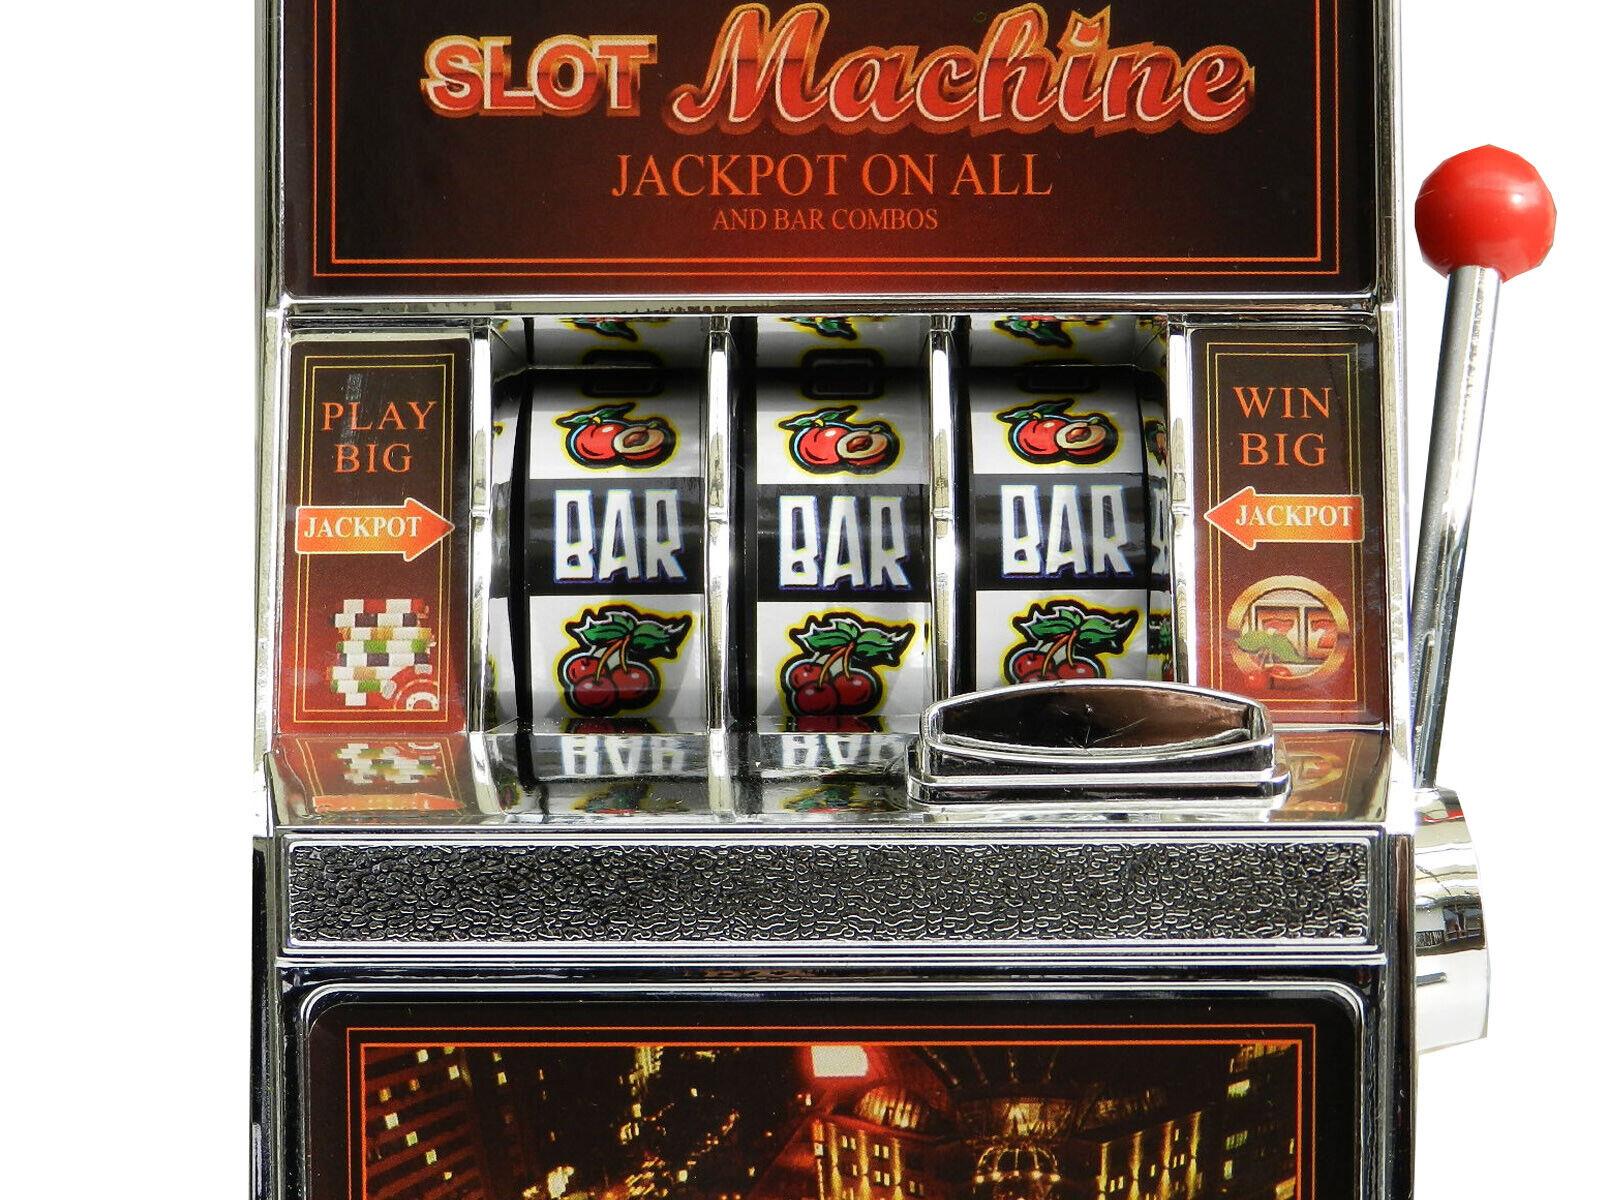 Lighted casino cherry slot machine bank online casino fast payouts